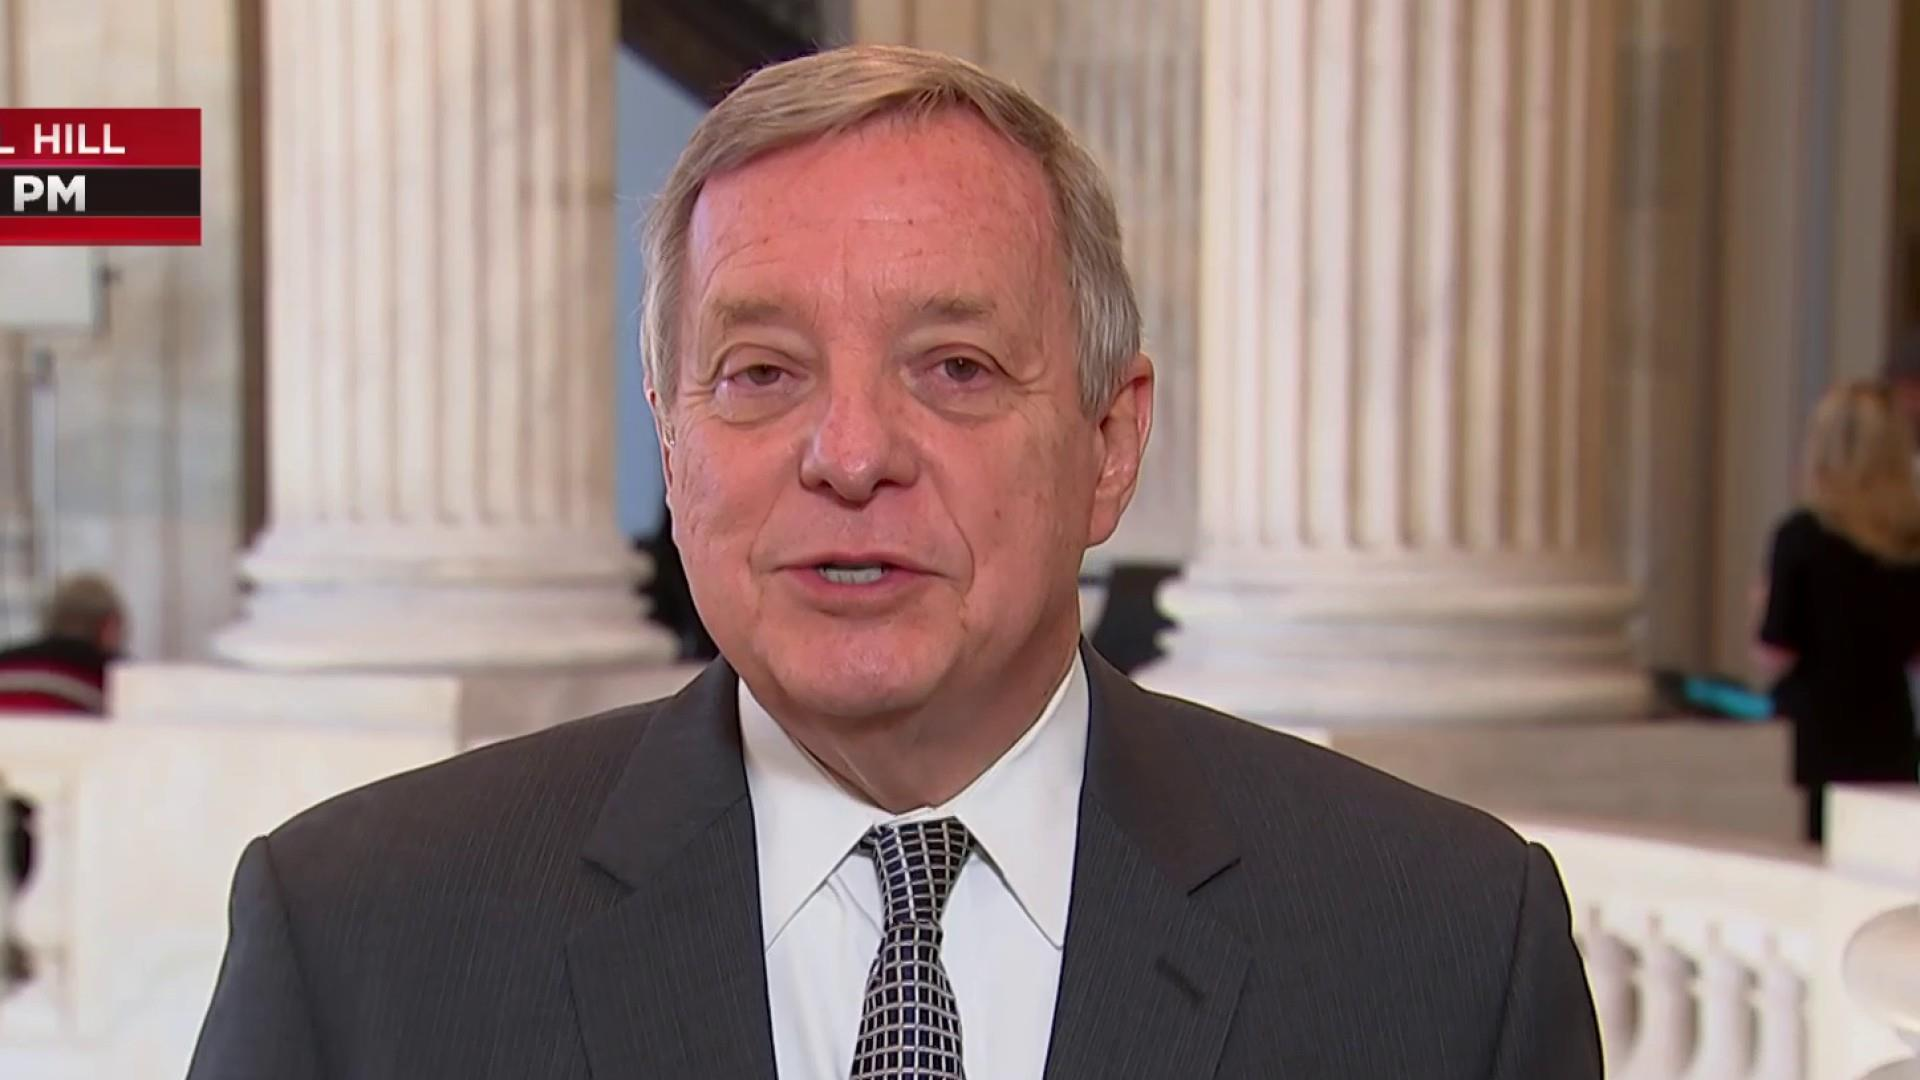 Sen. Durbin: President acting as 'shutdown cheerleader' to rally Republicans